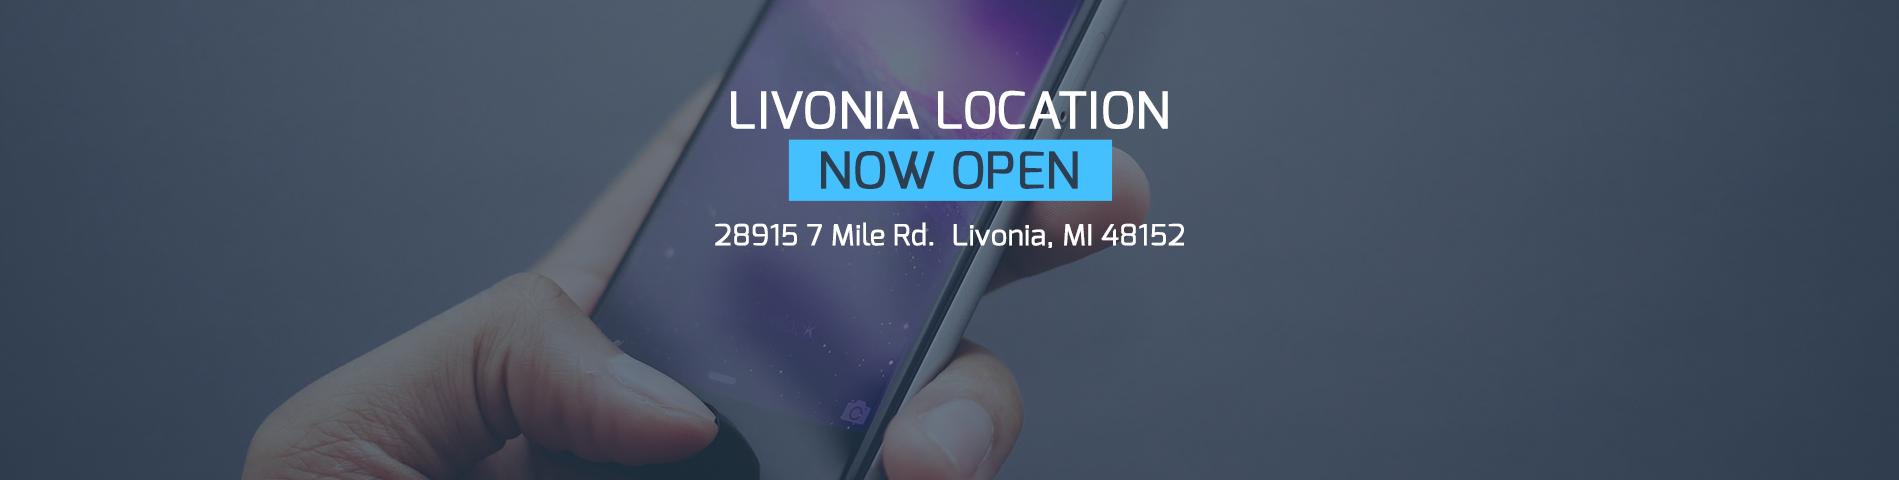 MDPR-Livonia-Opening-Banner-2